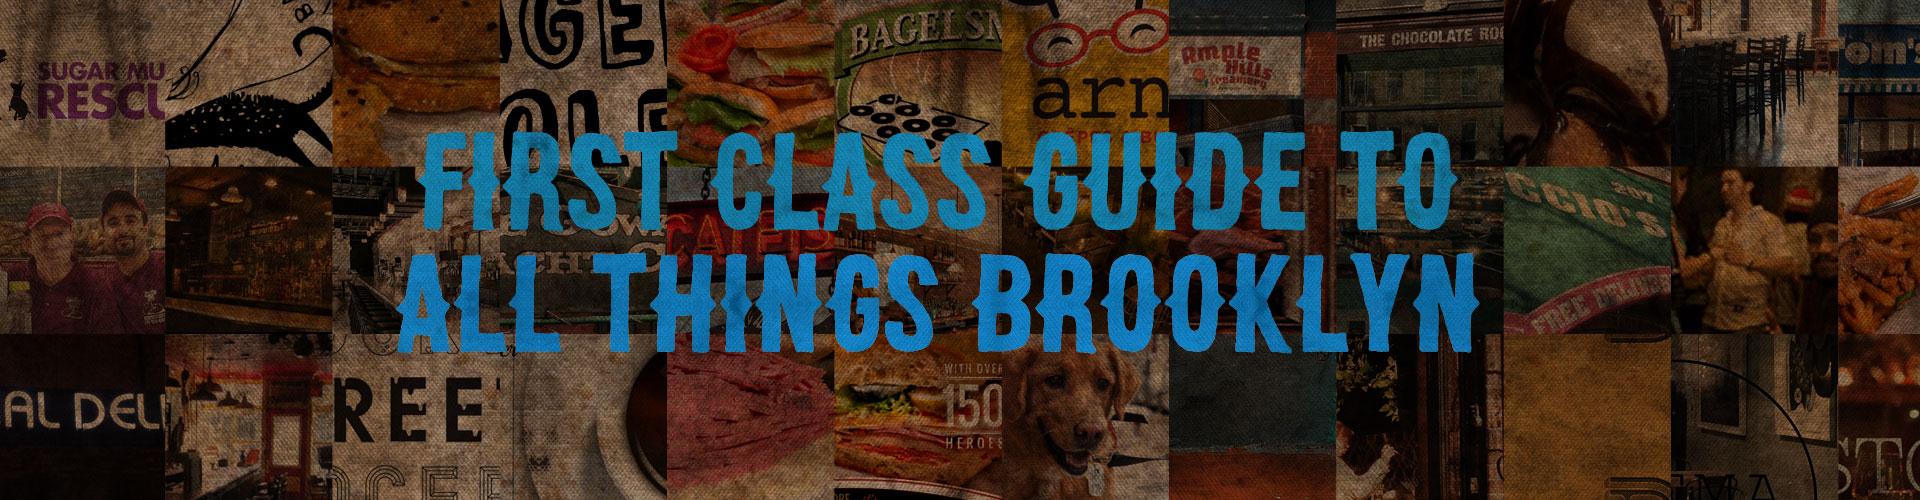 All Things Brooklyn